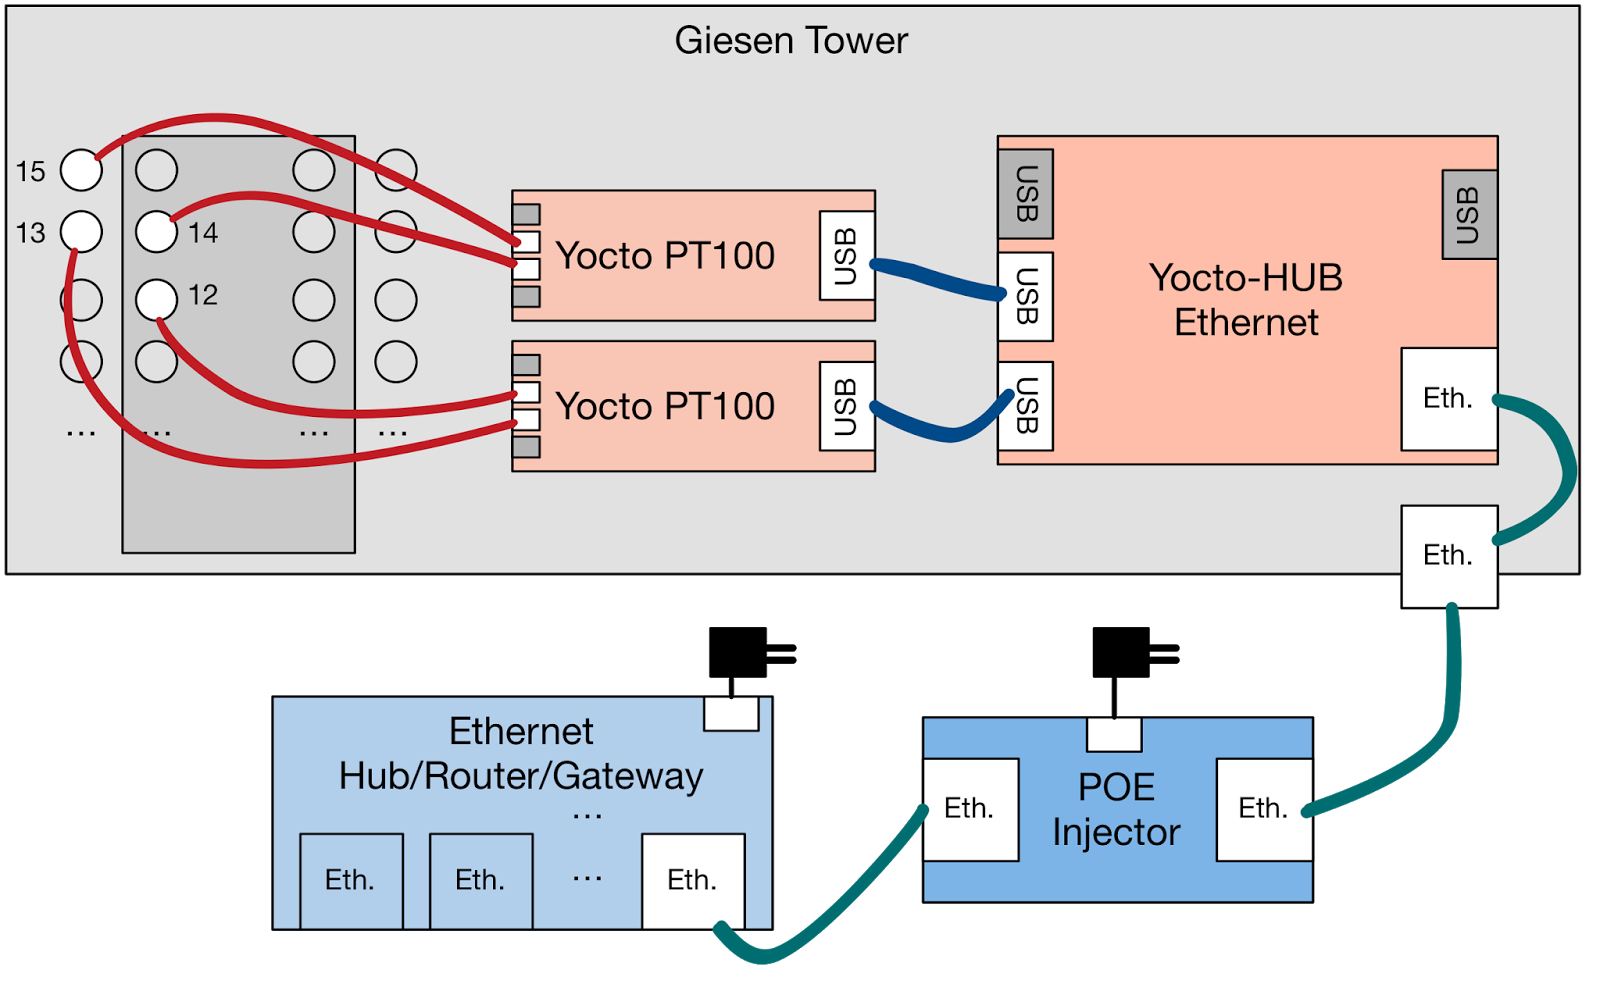 dsl splitter wiring diagram tj magna radio cat5e best library nid phone jack at t box